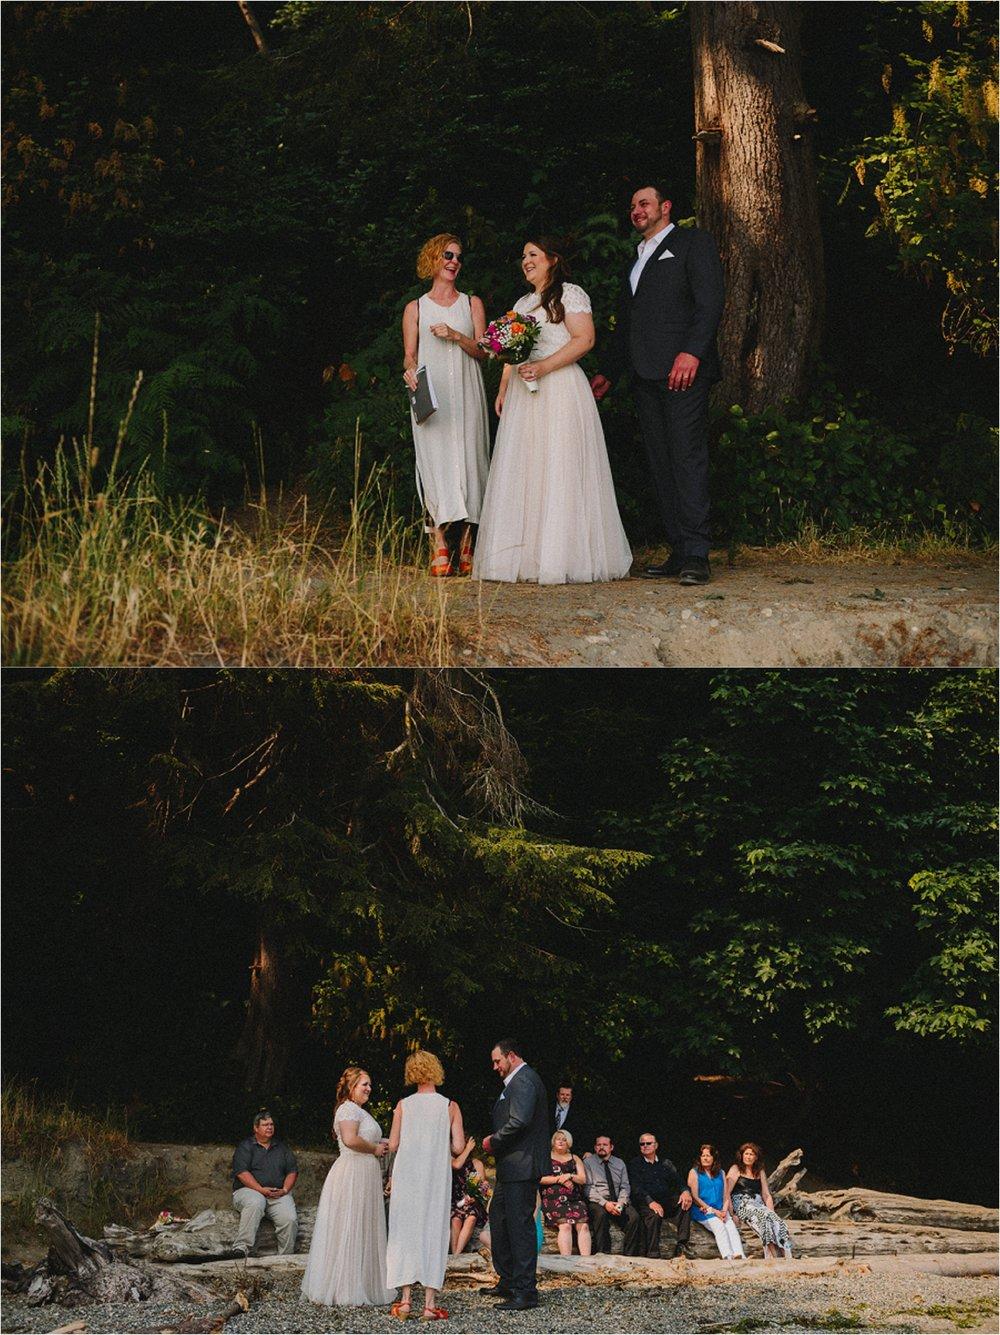 owen-beach-priest-point-park-tacoma-washington-elopement-jannicka-mayte-anchorage-alaska-wedding-elopement-photographer (33).jpg